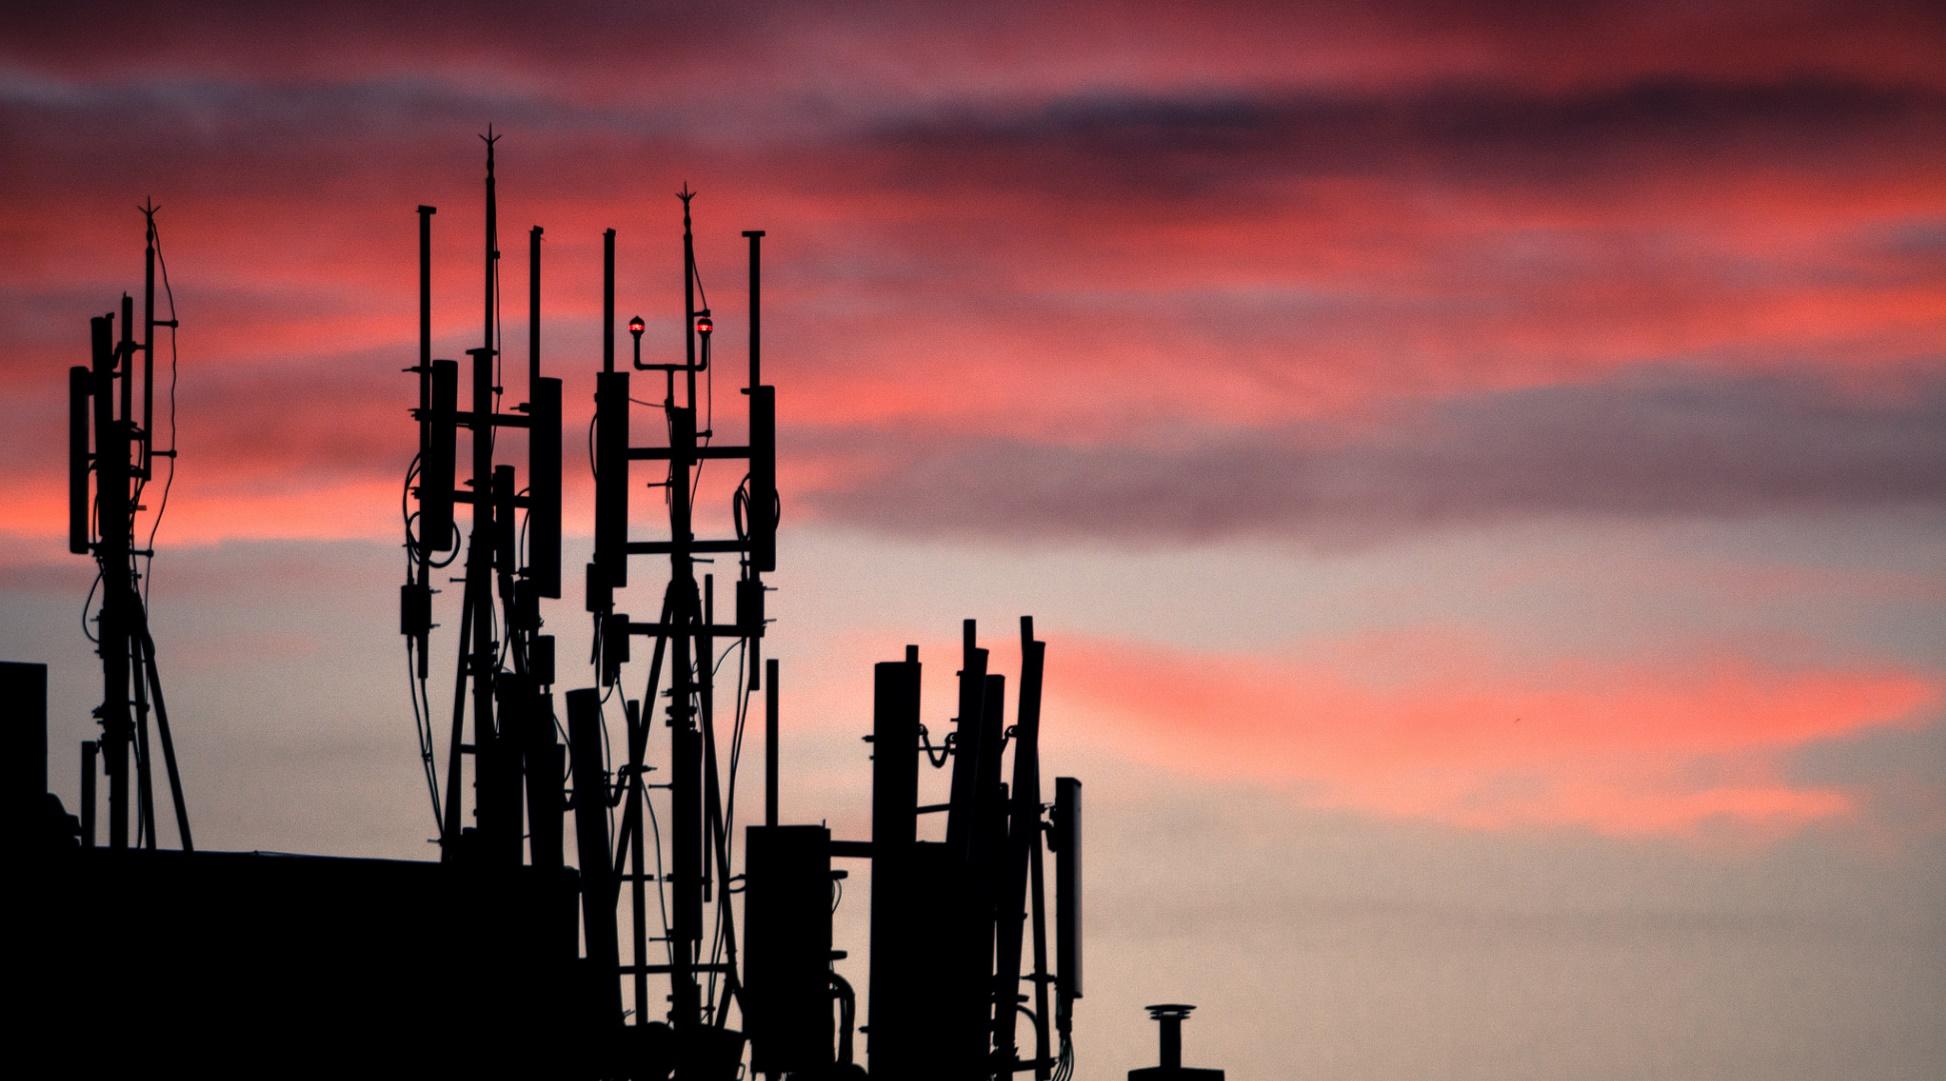 Nuevo récord de transmisión inalámbrica de datos: 6 Gbps a lo largo de 37 Km